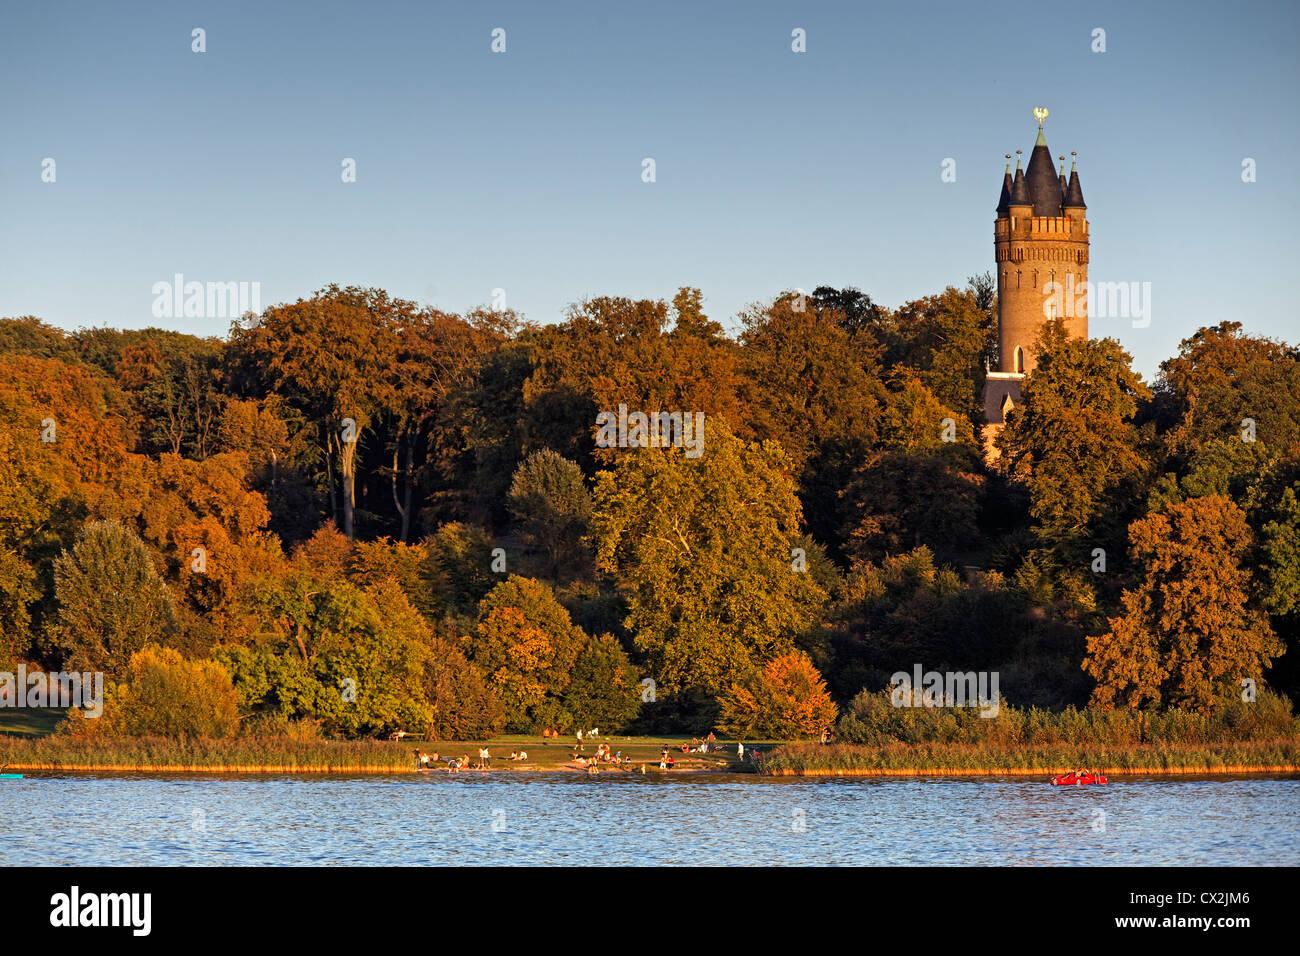 Flatow Tower in Park Babelsberg, Potsdam, Brandenburg, Germany - Stock Image